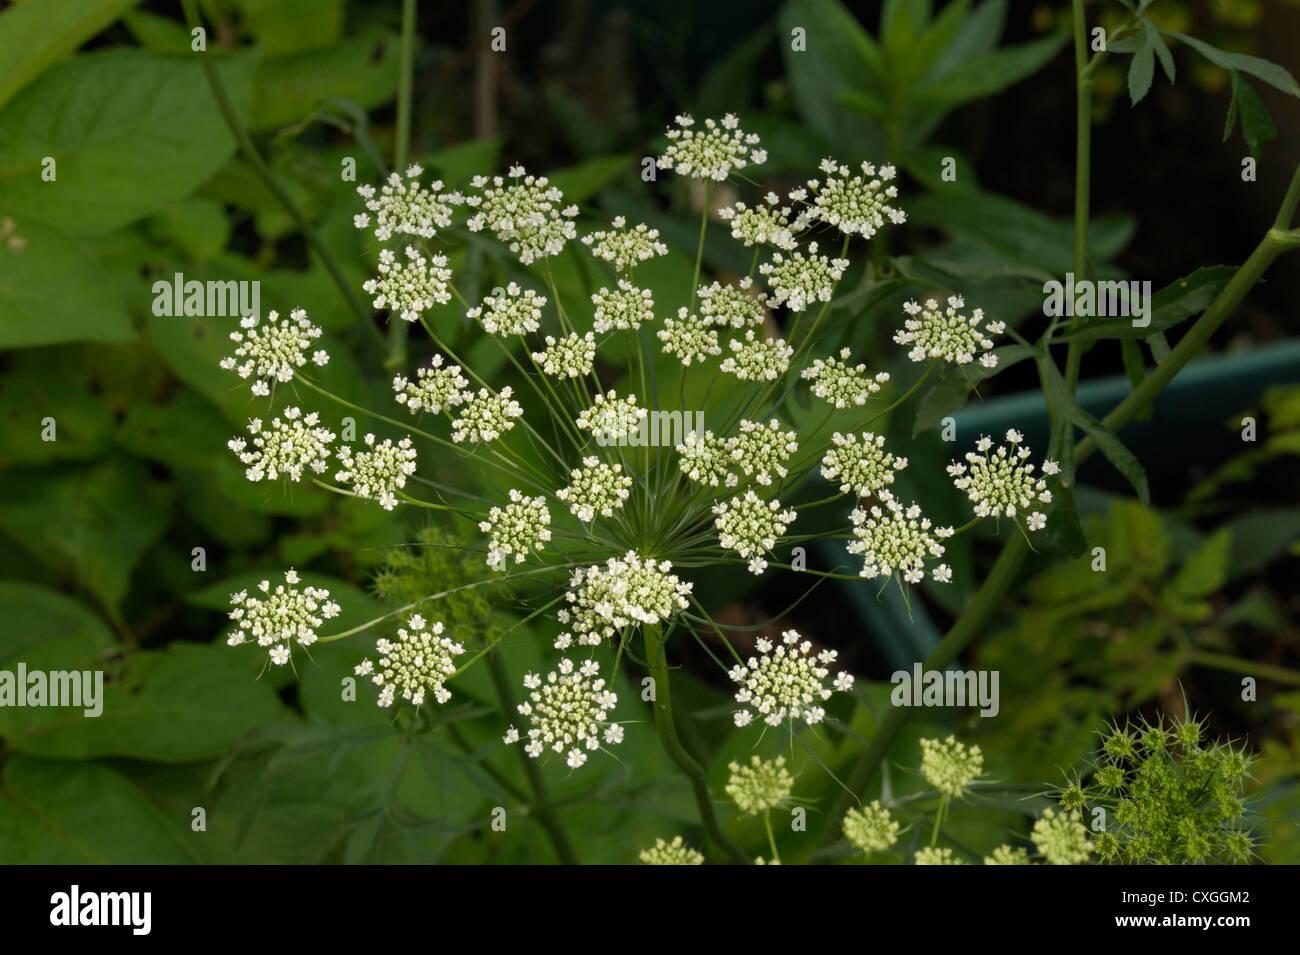 Bullwort flowers, Ammi majus Stock Photo